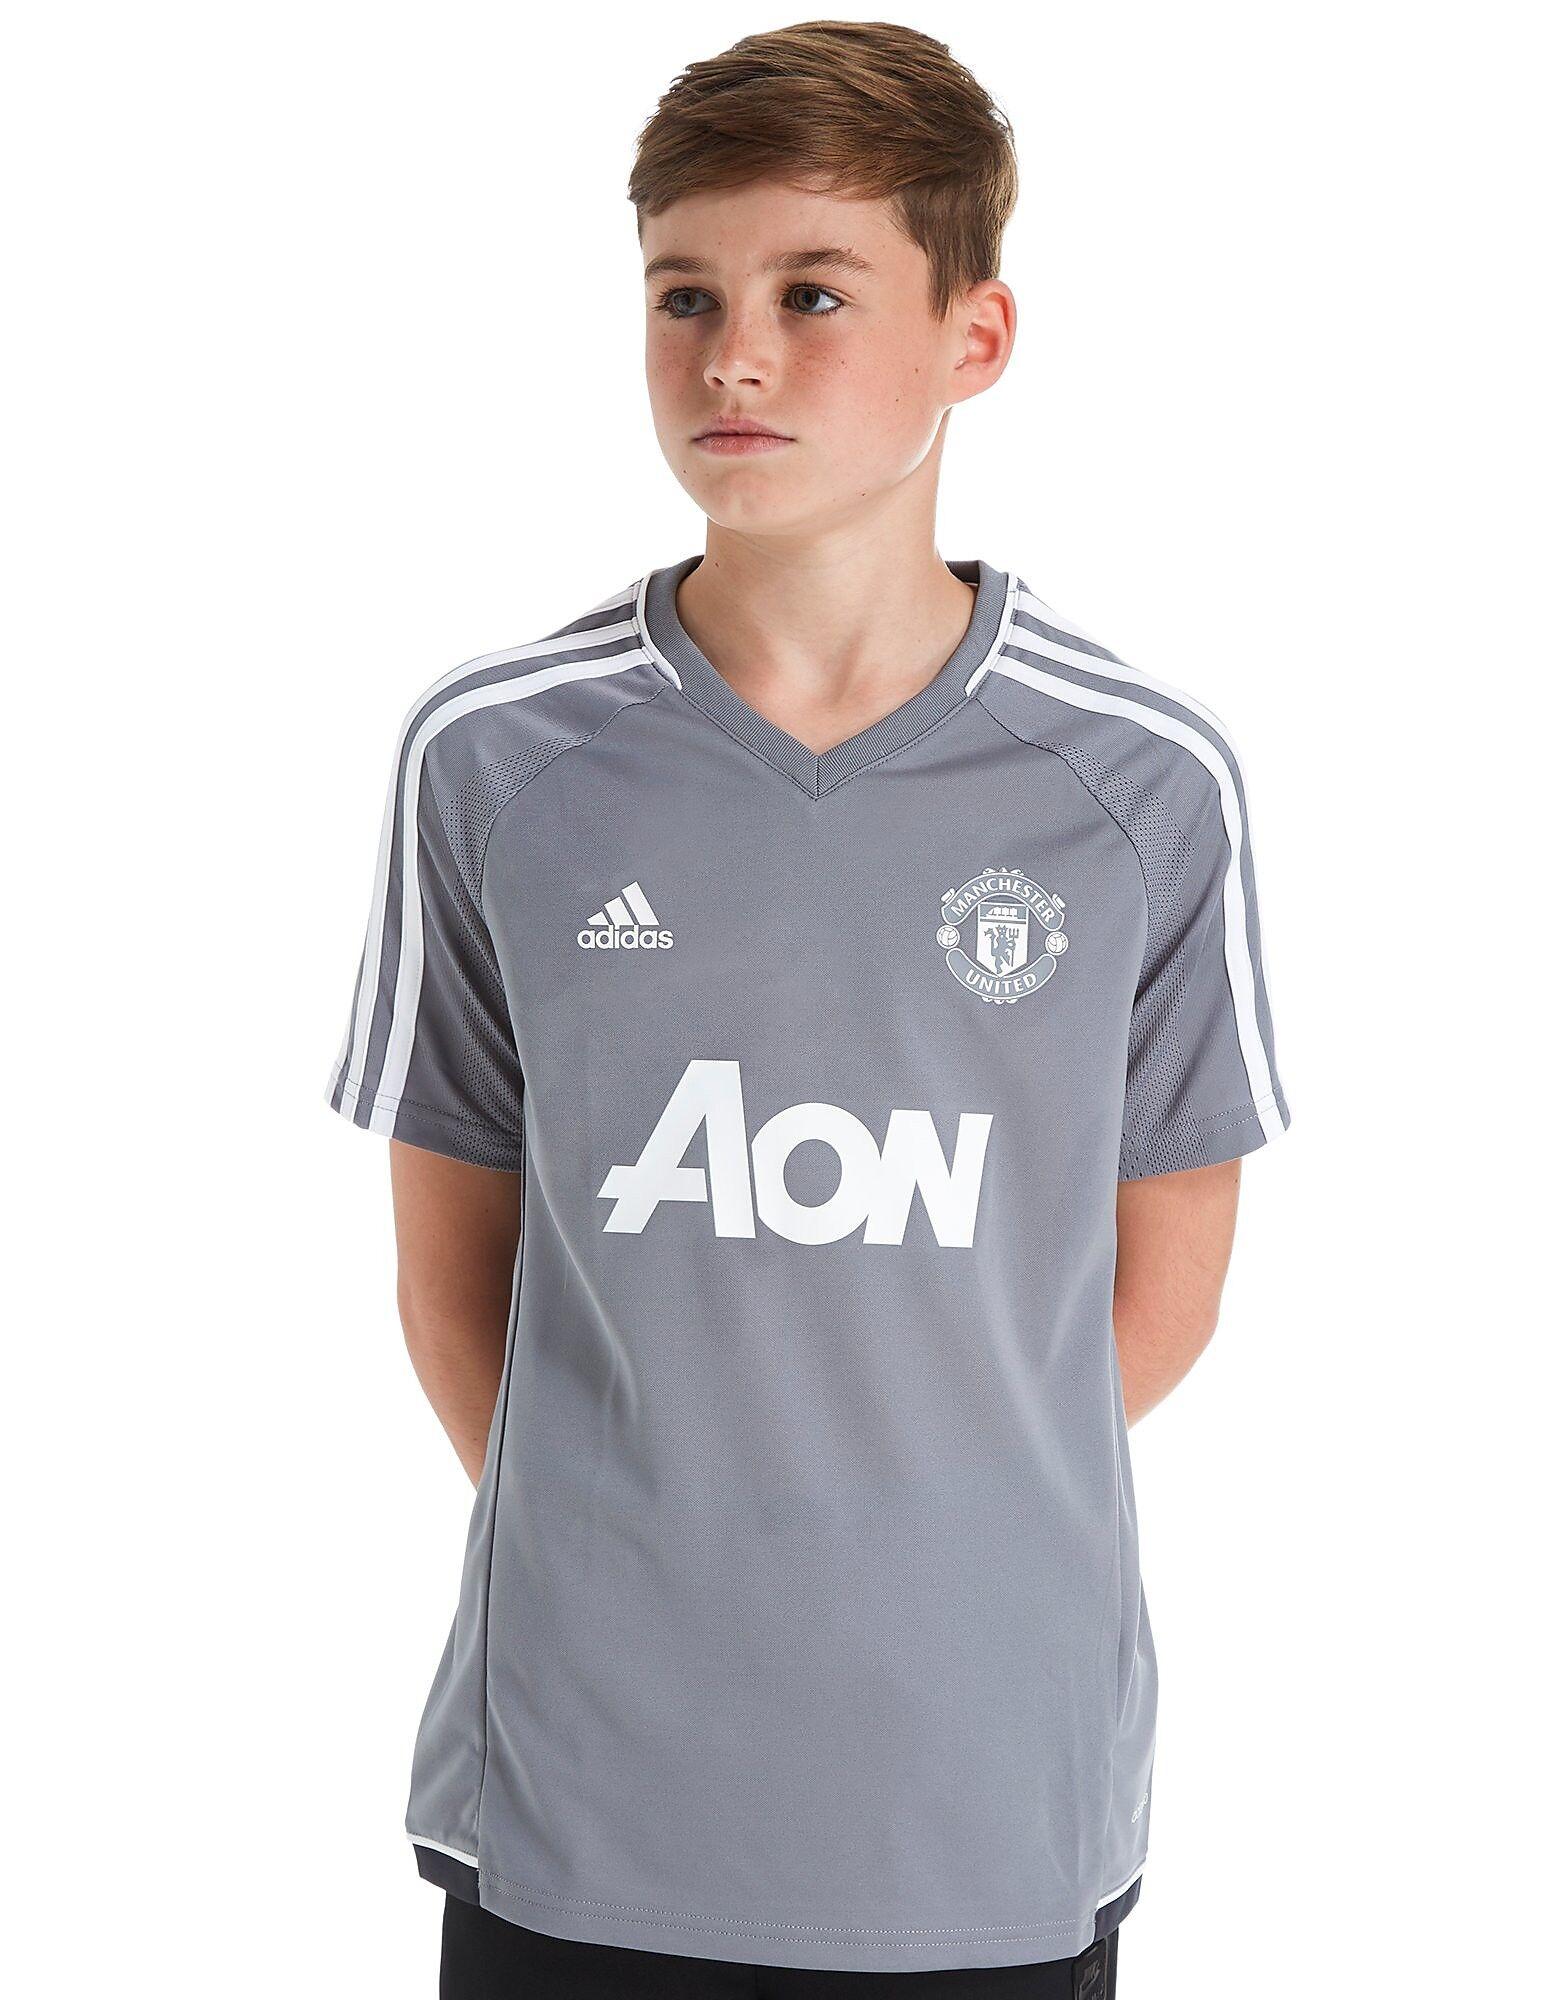 Image of Adidas Manchester United 2017 Training Shirt Junior - Kids, Harmaa